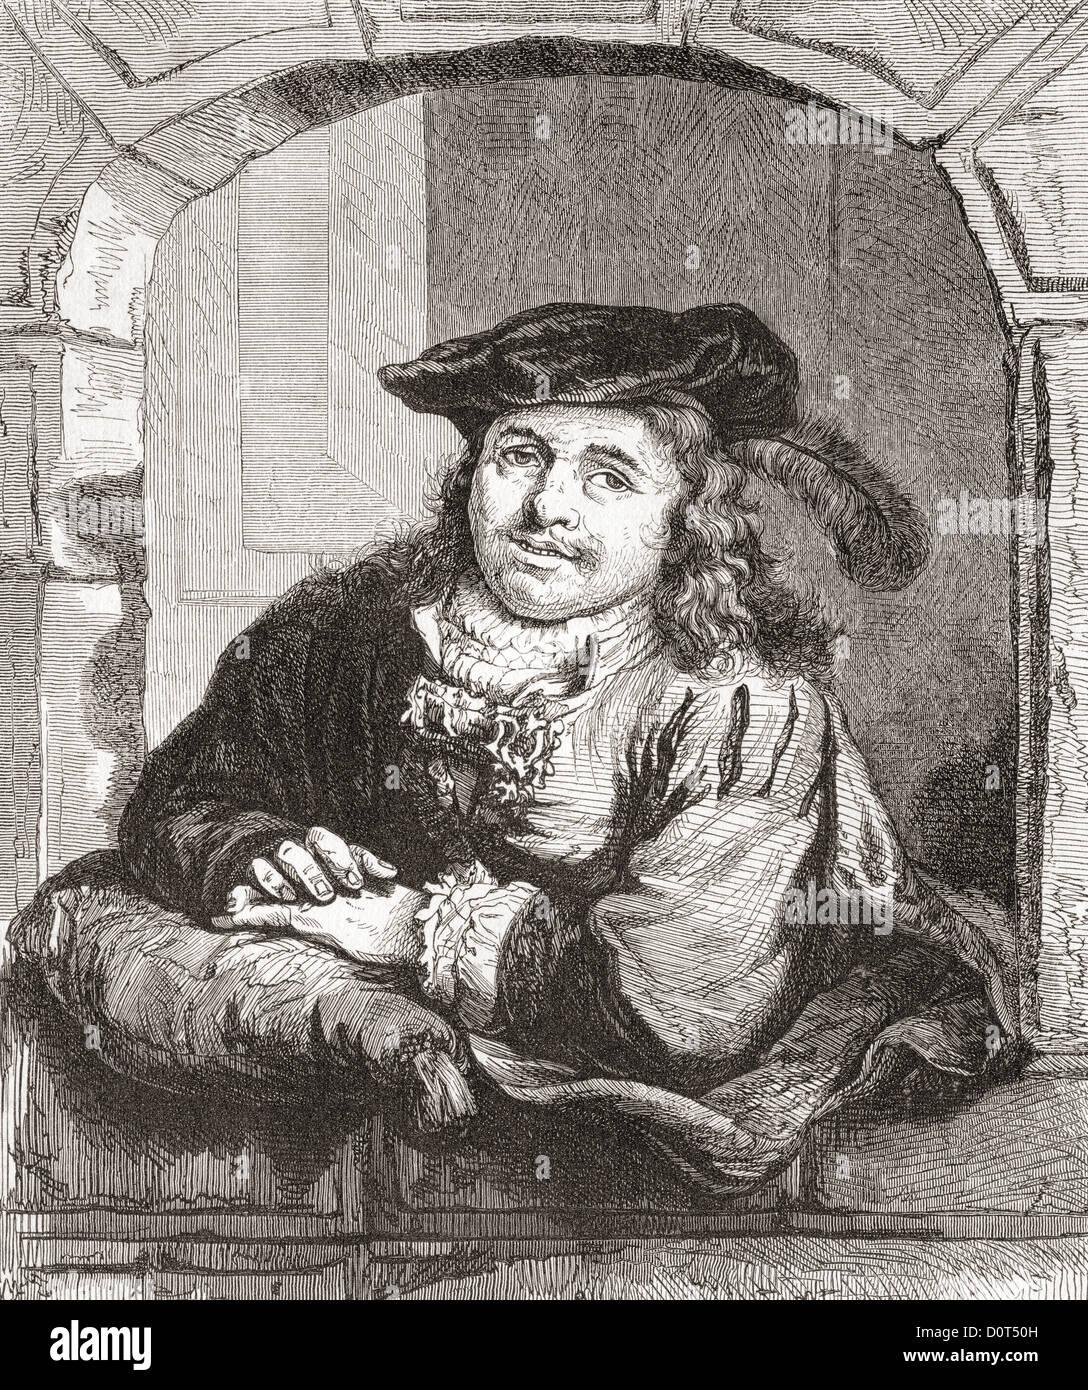 Ferdinand Bol, 1616 –1680. Dutch artist, etcher and draftsman. - Stock Image